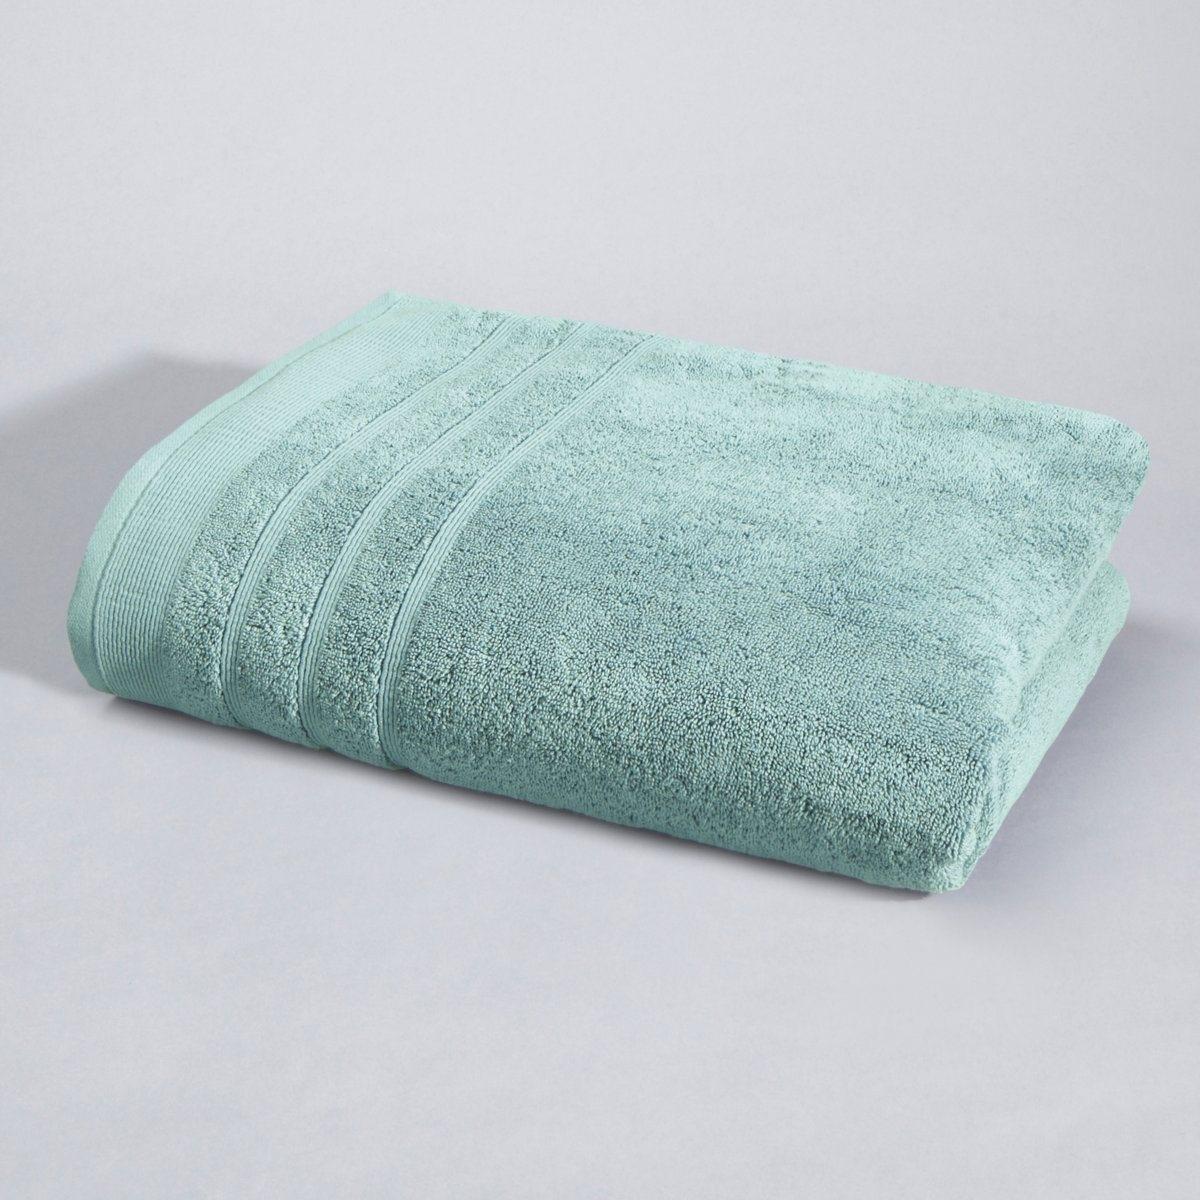 Полотенце банное 600 г/м², Качество Best полотенца william roberts полотенце банное aberdeen цвет queen shadow серо голубой 70х140 см